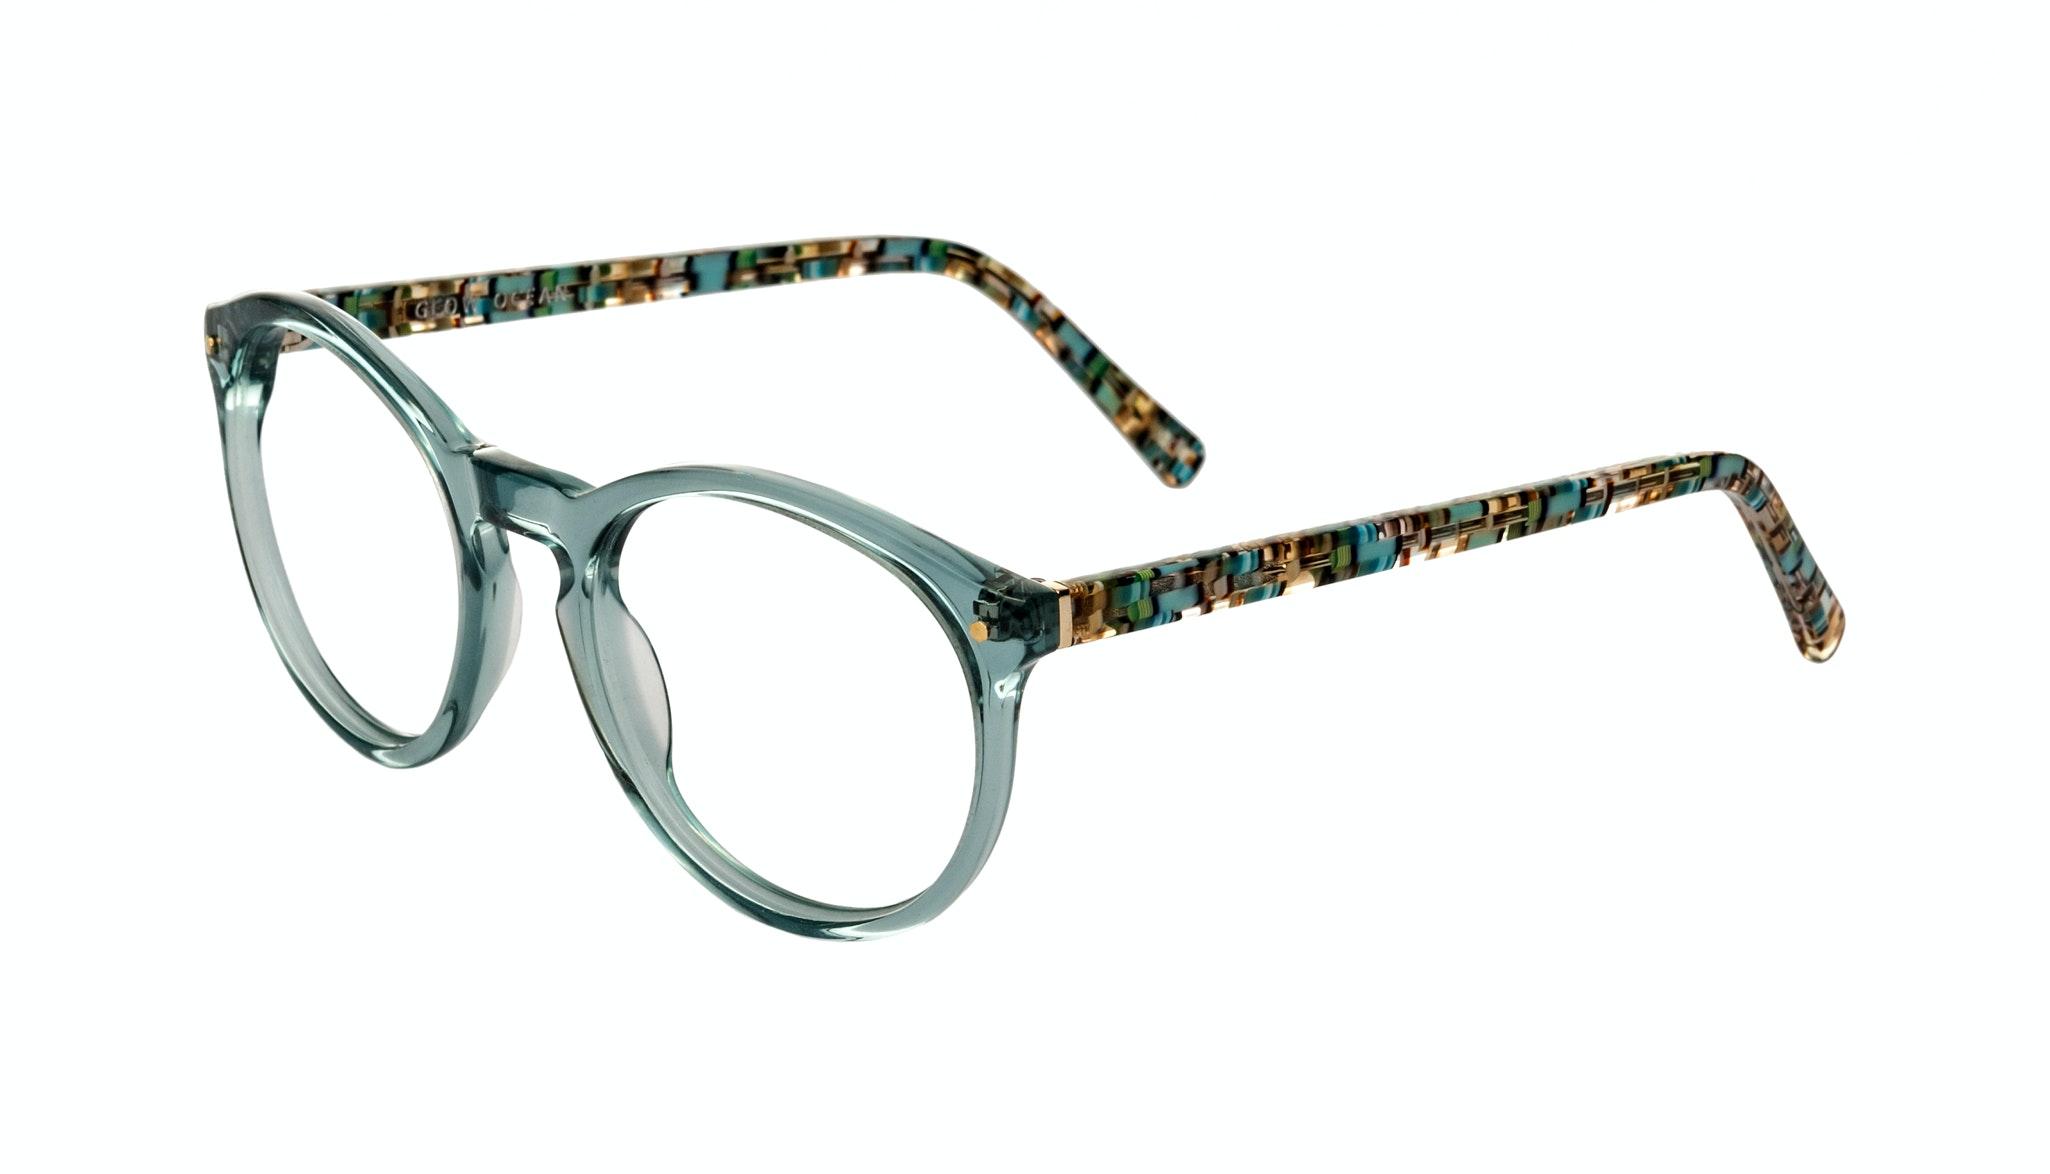 Affordable Fashion Glasses Round Eyeglasses Women Glow Ocean Tilt